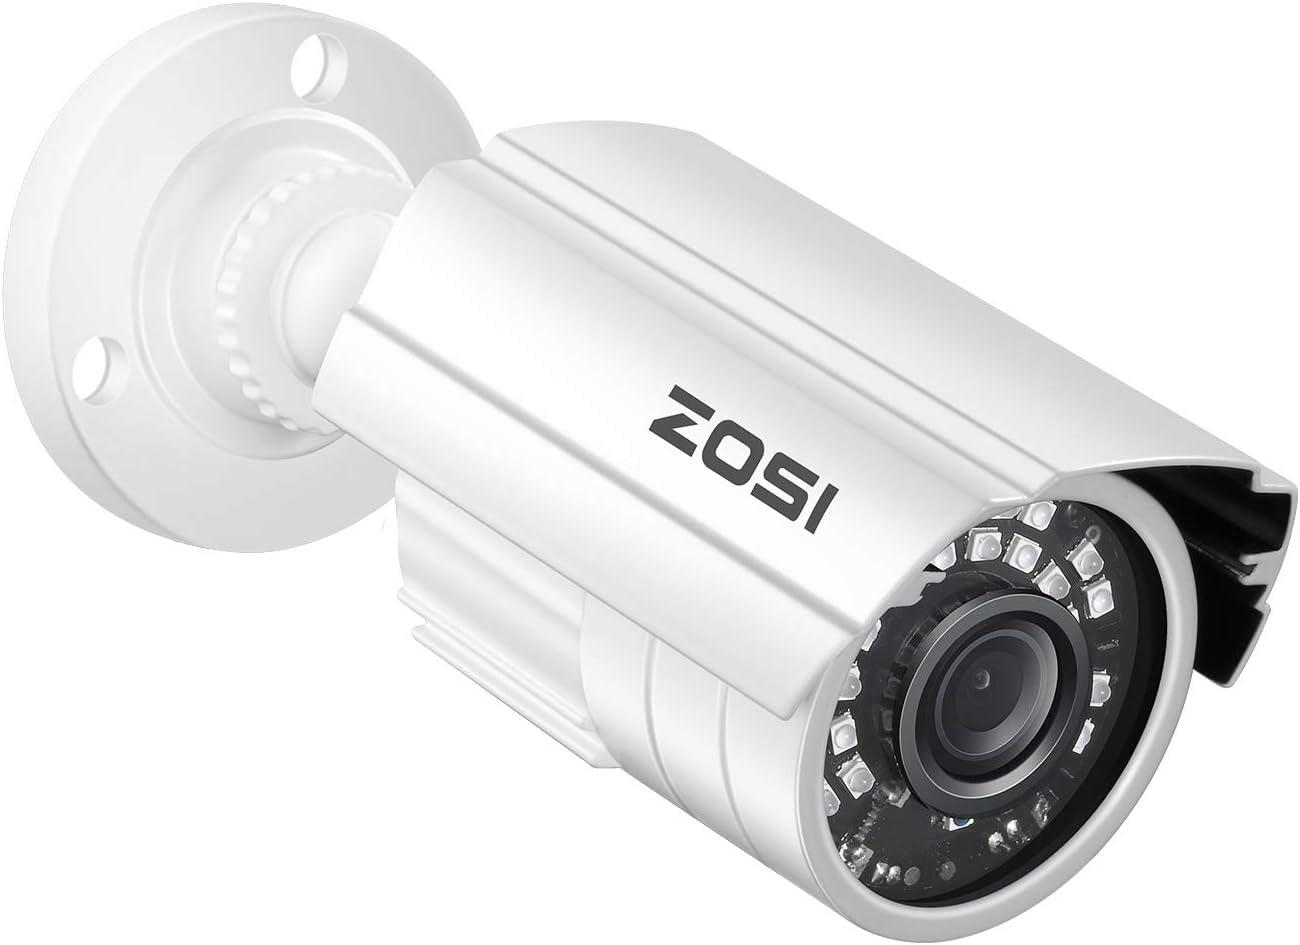 ZOSI 1080P 2.0MP HD 1920TVL Hybrid 4-in-1 TVI 960H Excellence CVI AHD excellence CVBS